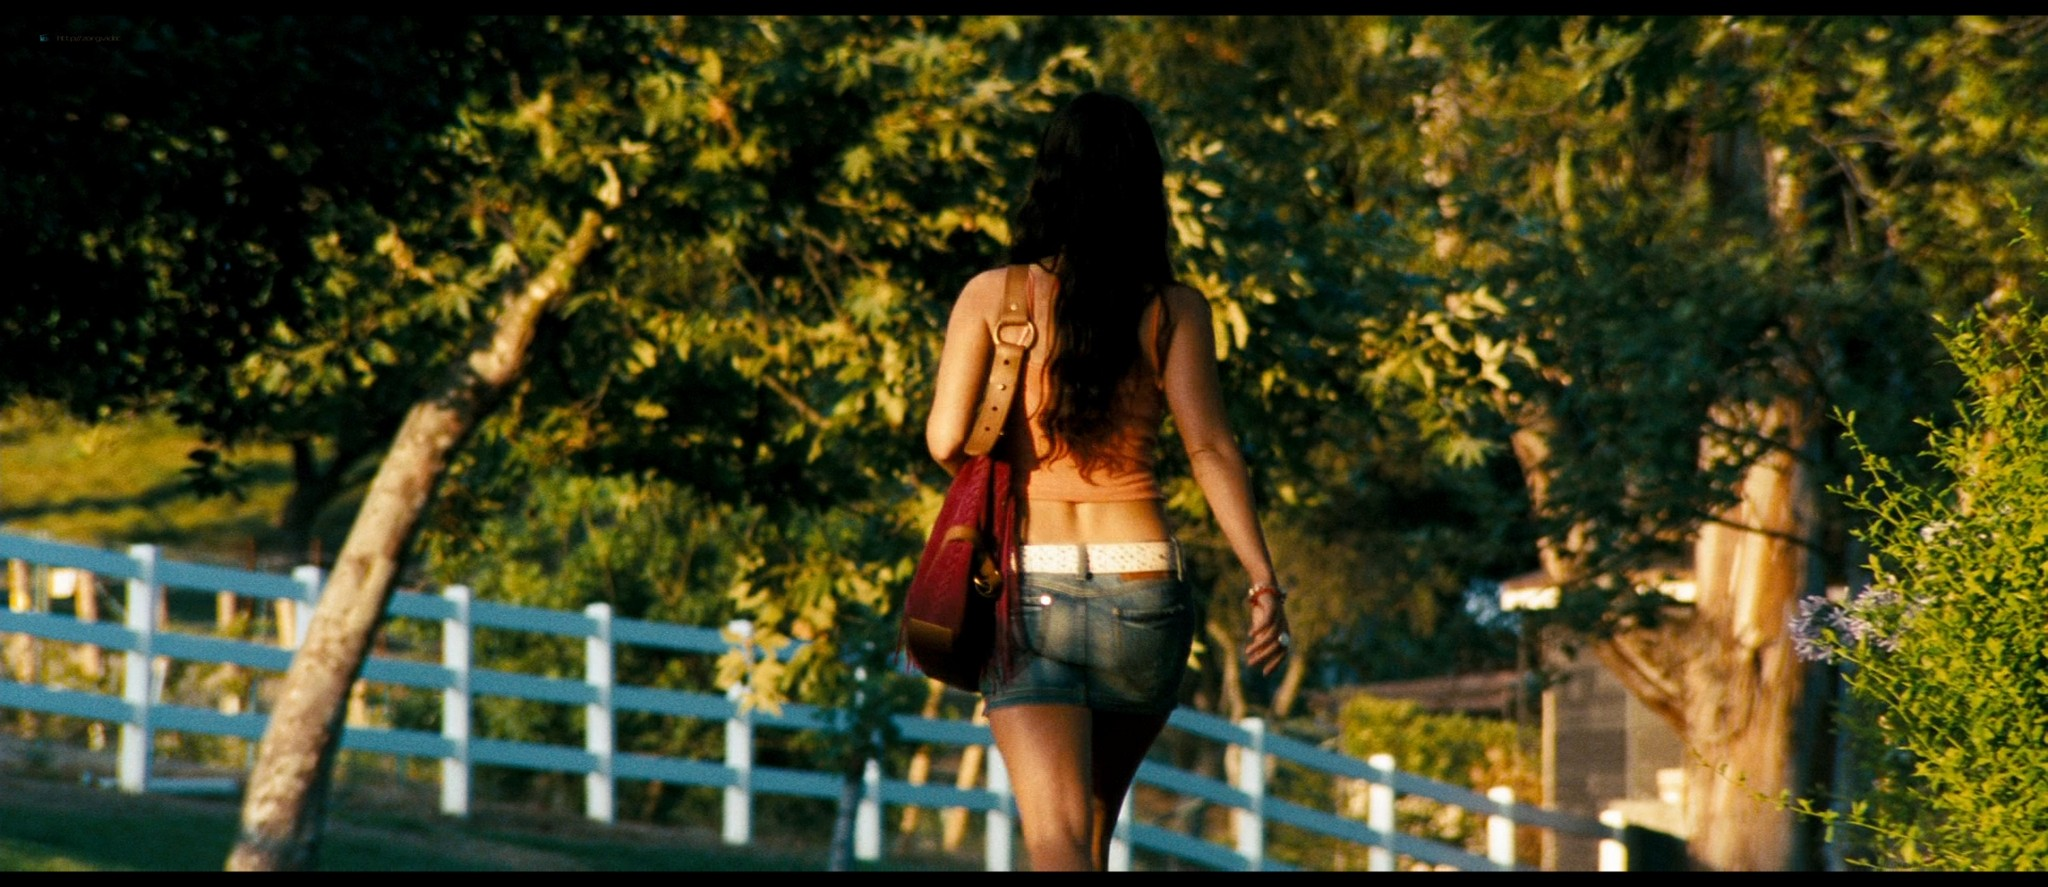 Megan Fox hot and sexy - Transformers (2007) HD 1080p BluRay Remux (19)